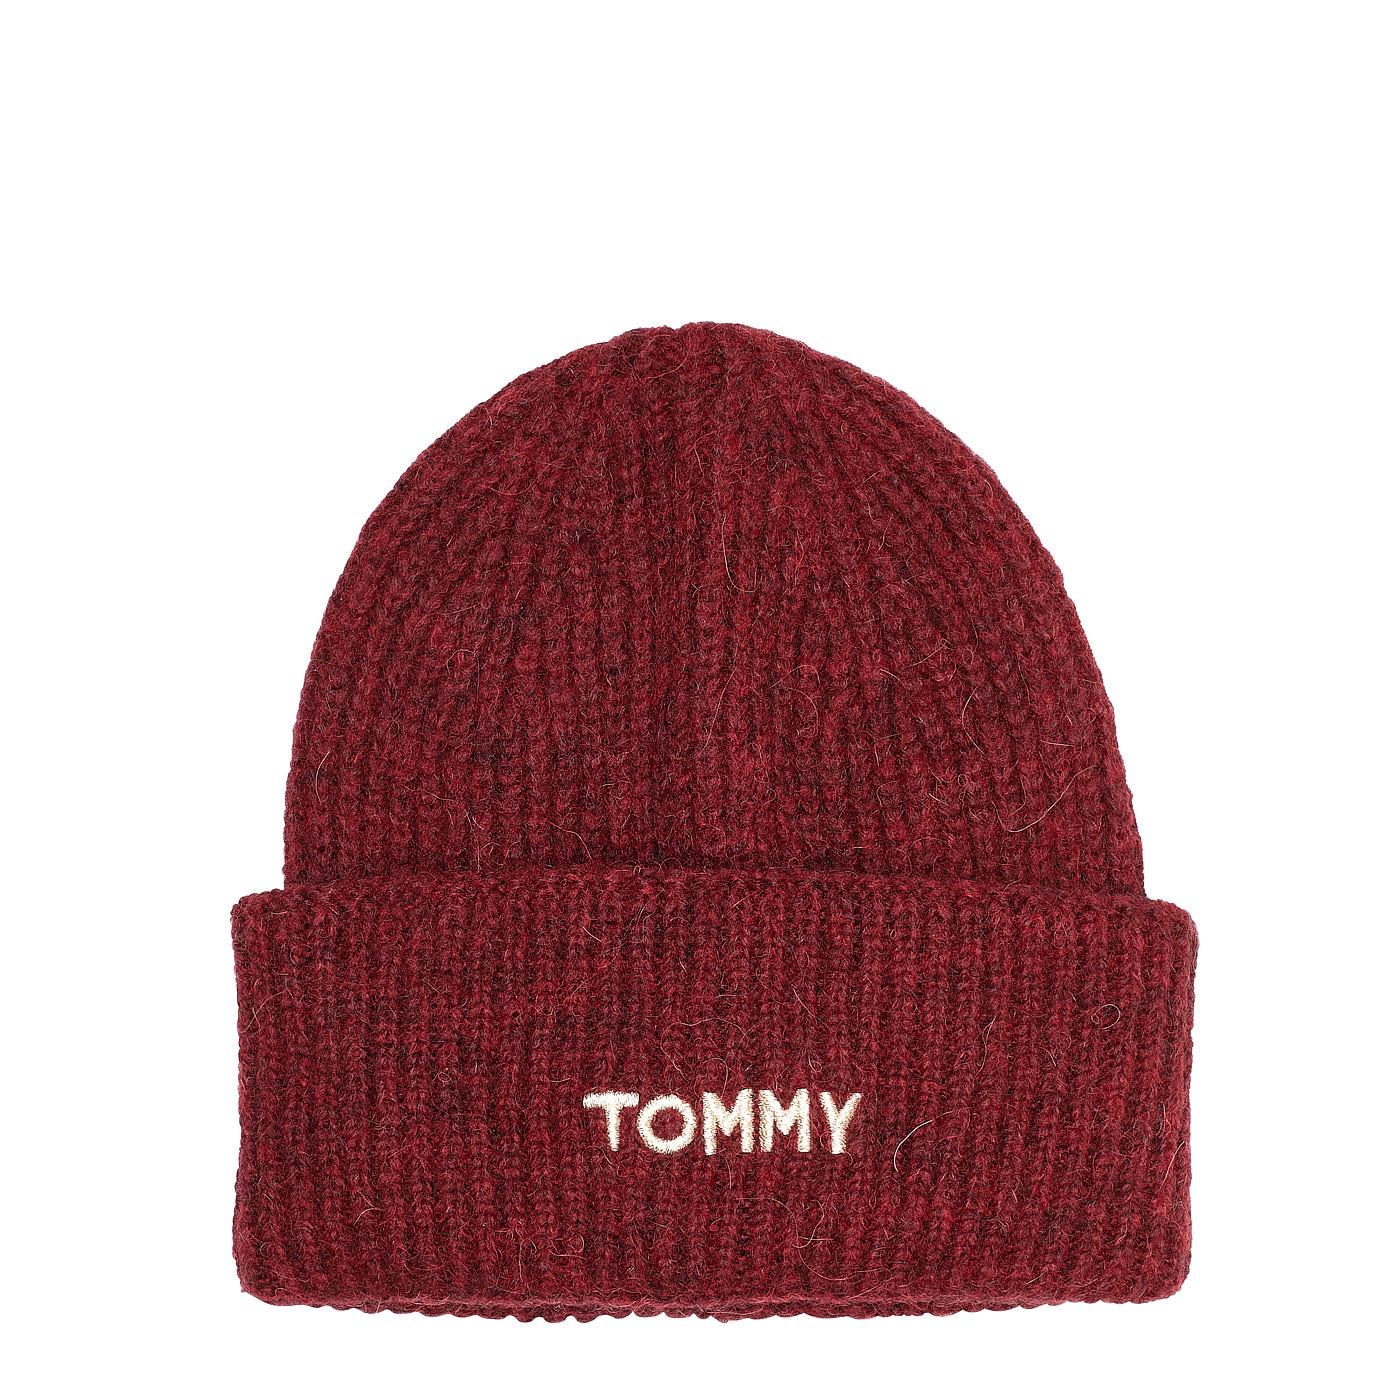 Flag bonnet AW0AW07175GBH001 - Tommy hilfiger - Modalova